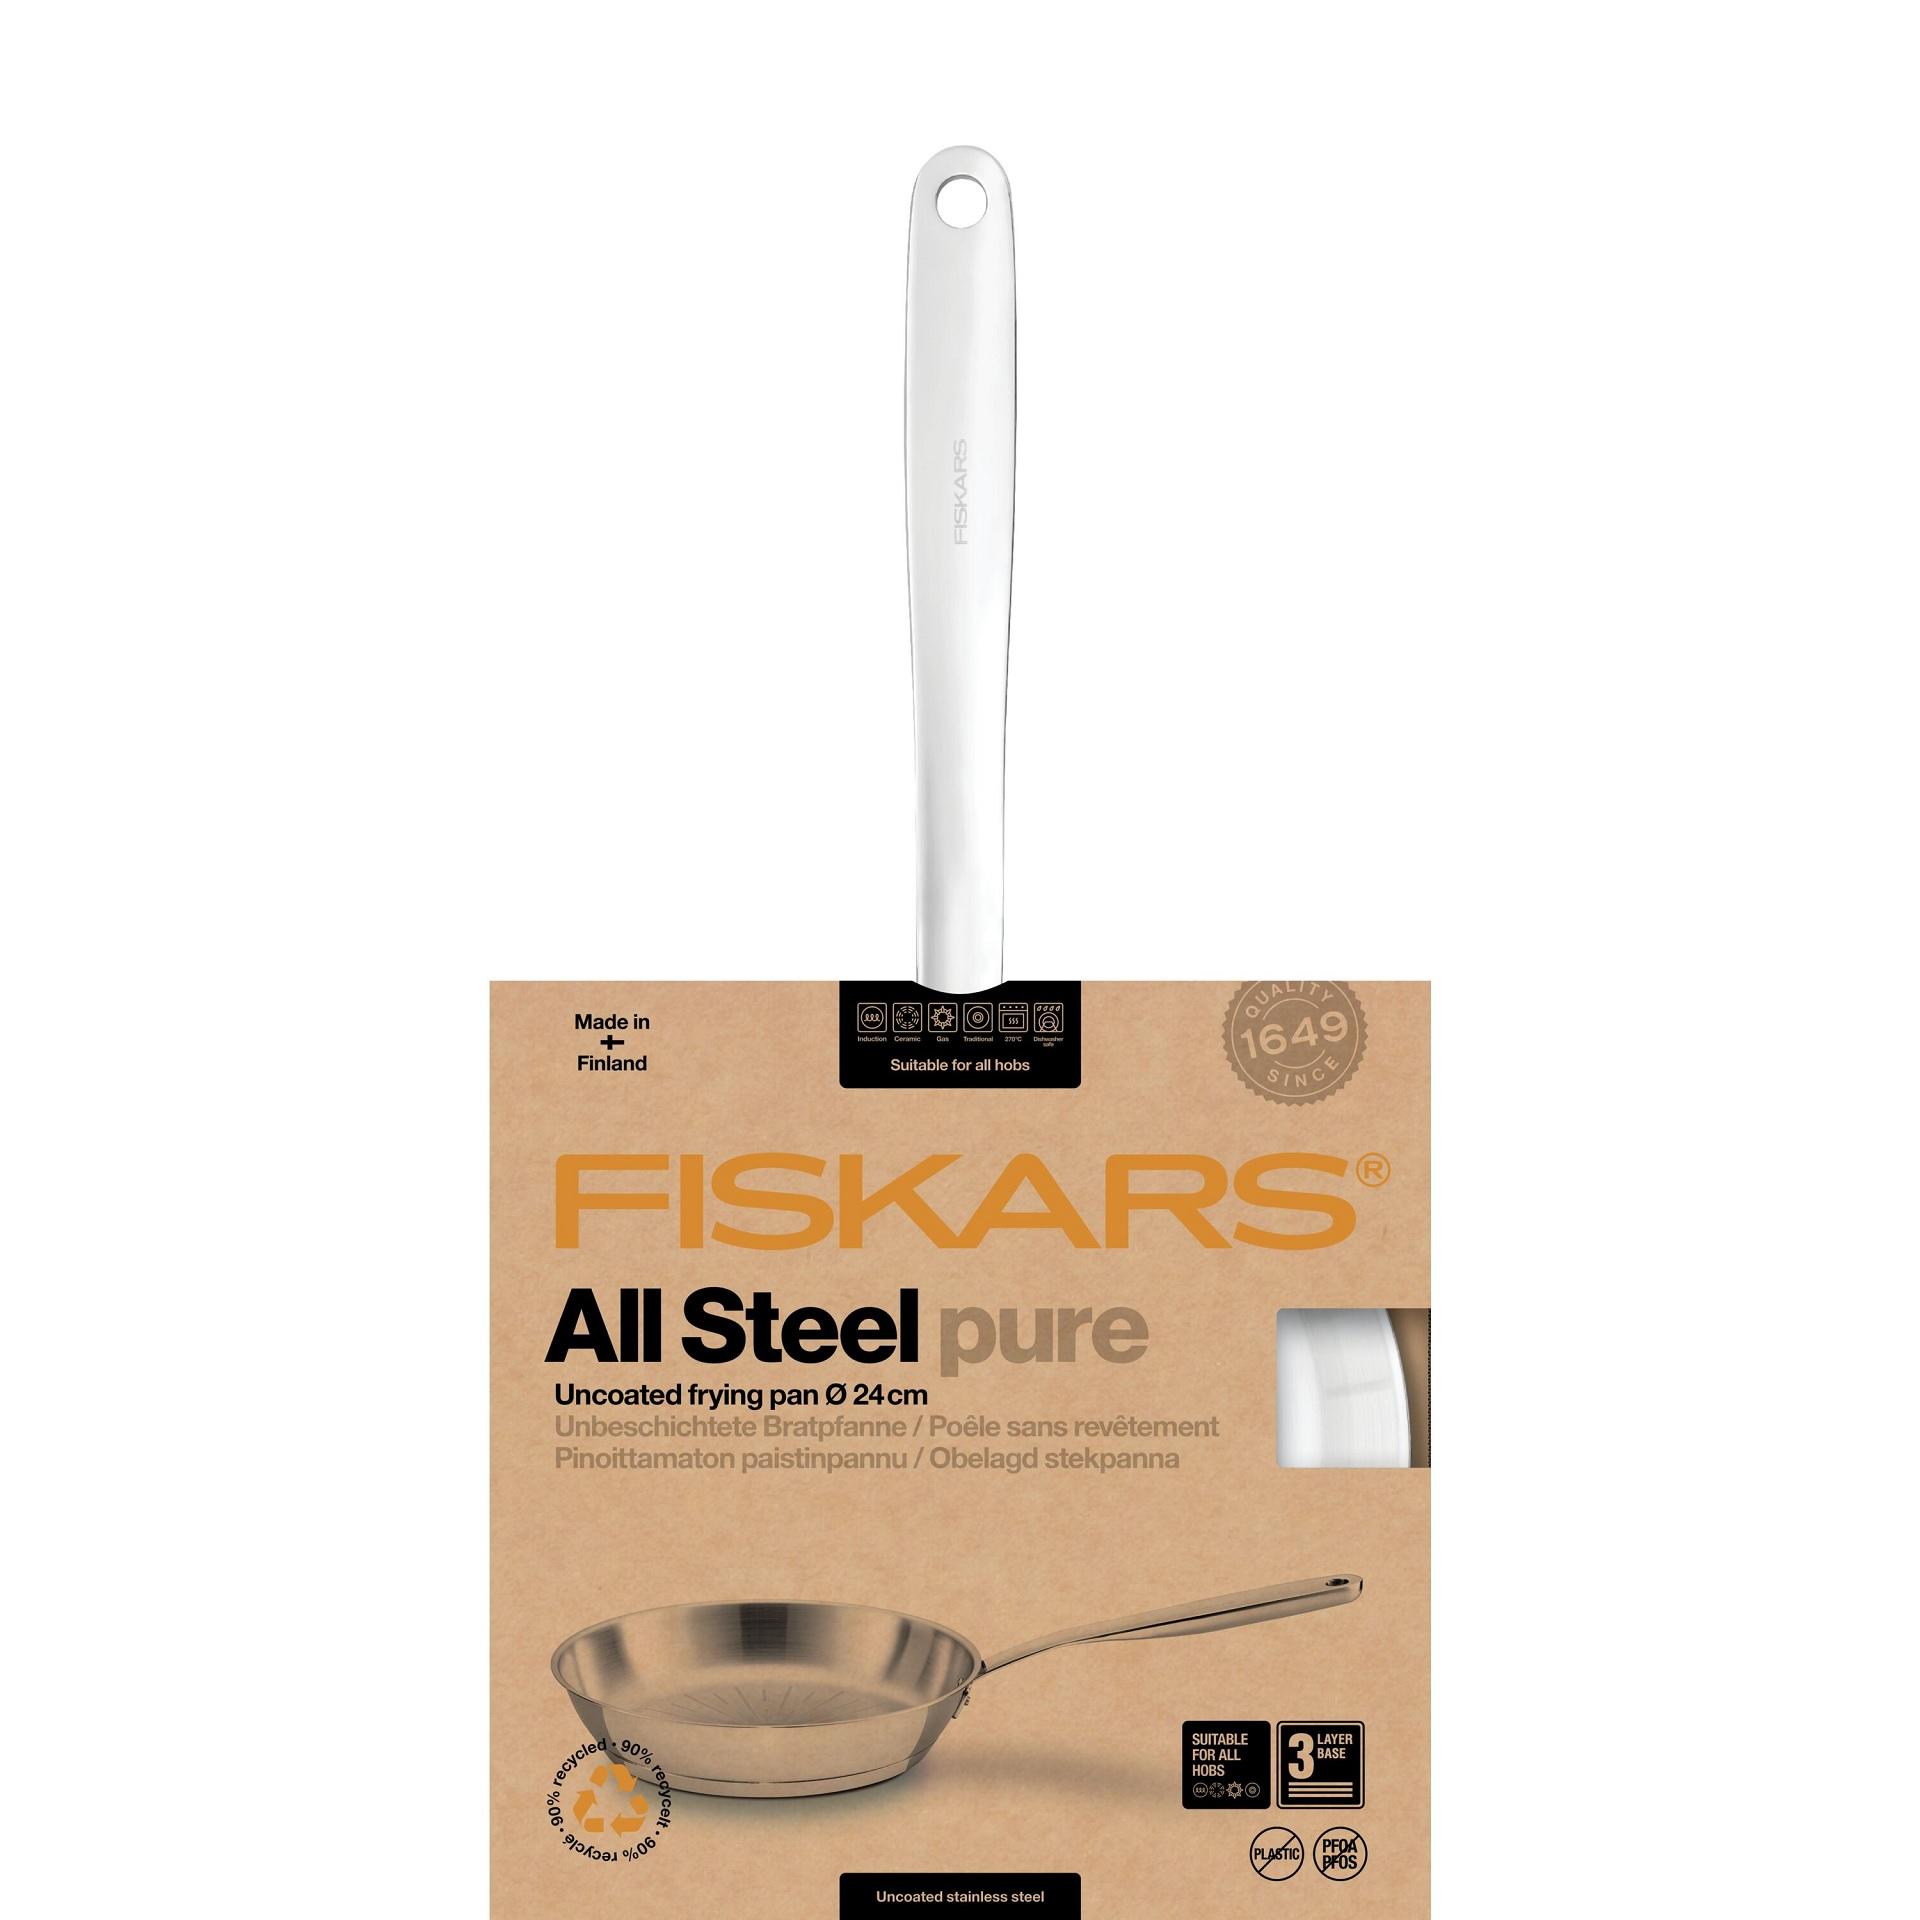 Fiskars All Steel Pure praepann 24cm